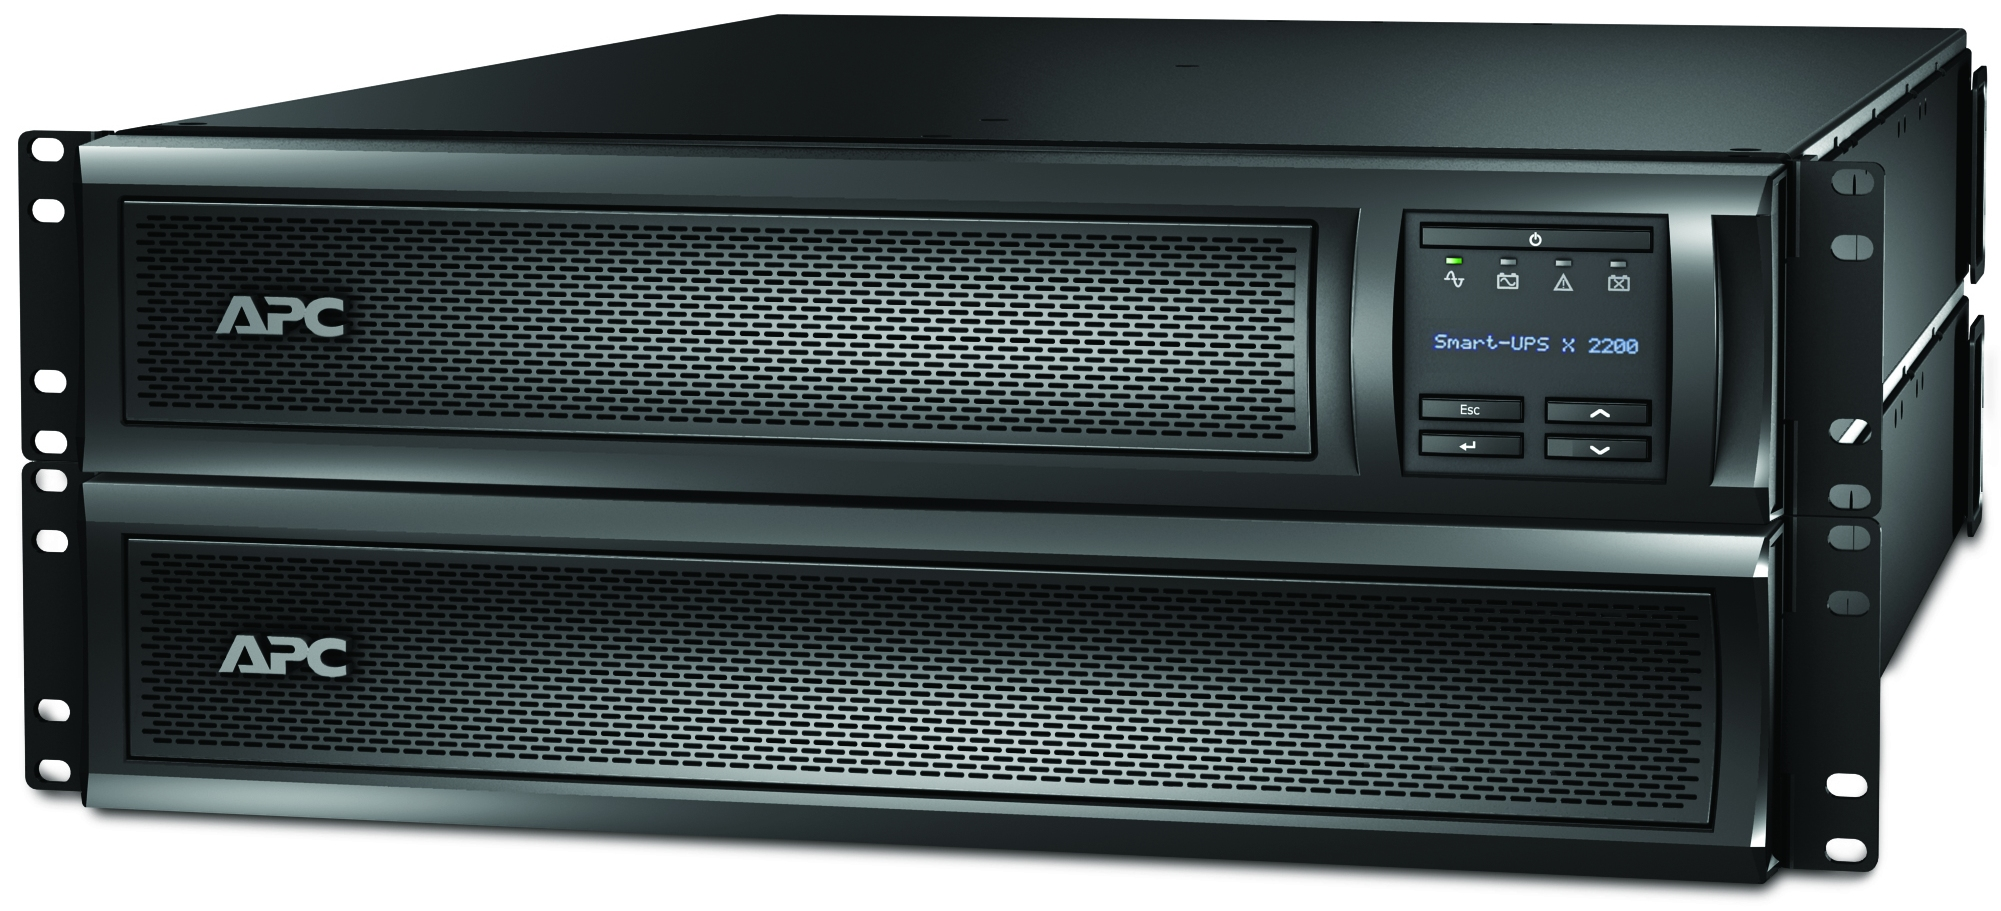 APC-by-Schneider-Electric-SMX2200R2HVNC-SMX120RMBP2U